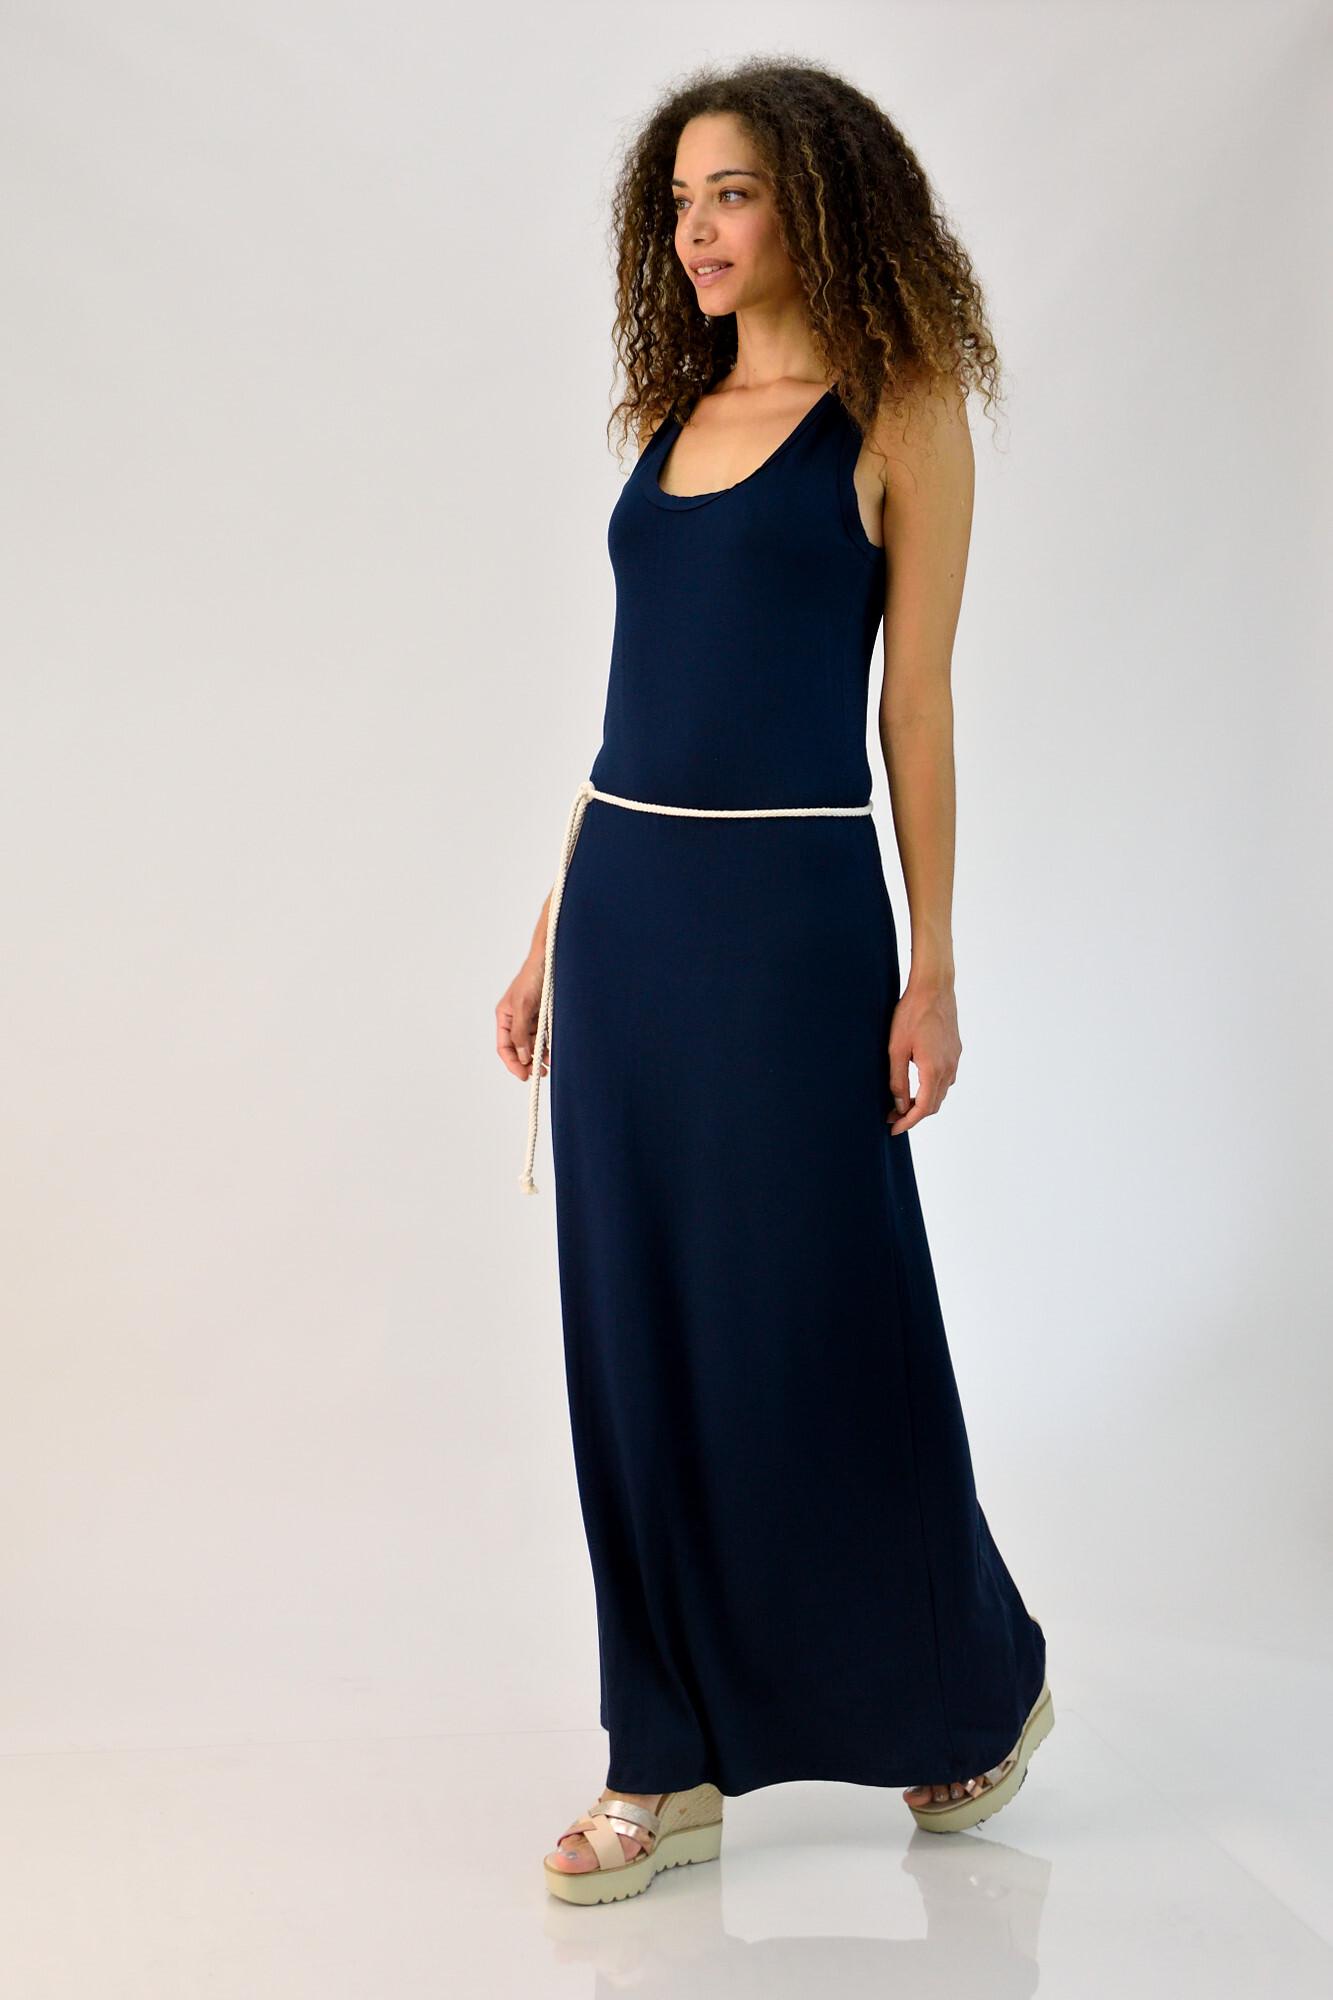 1c37e287305 Φόρεμα με αθλητική πλάτη και ζώνη   POTRE